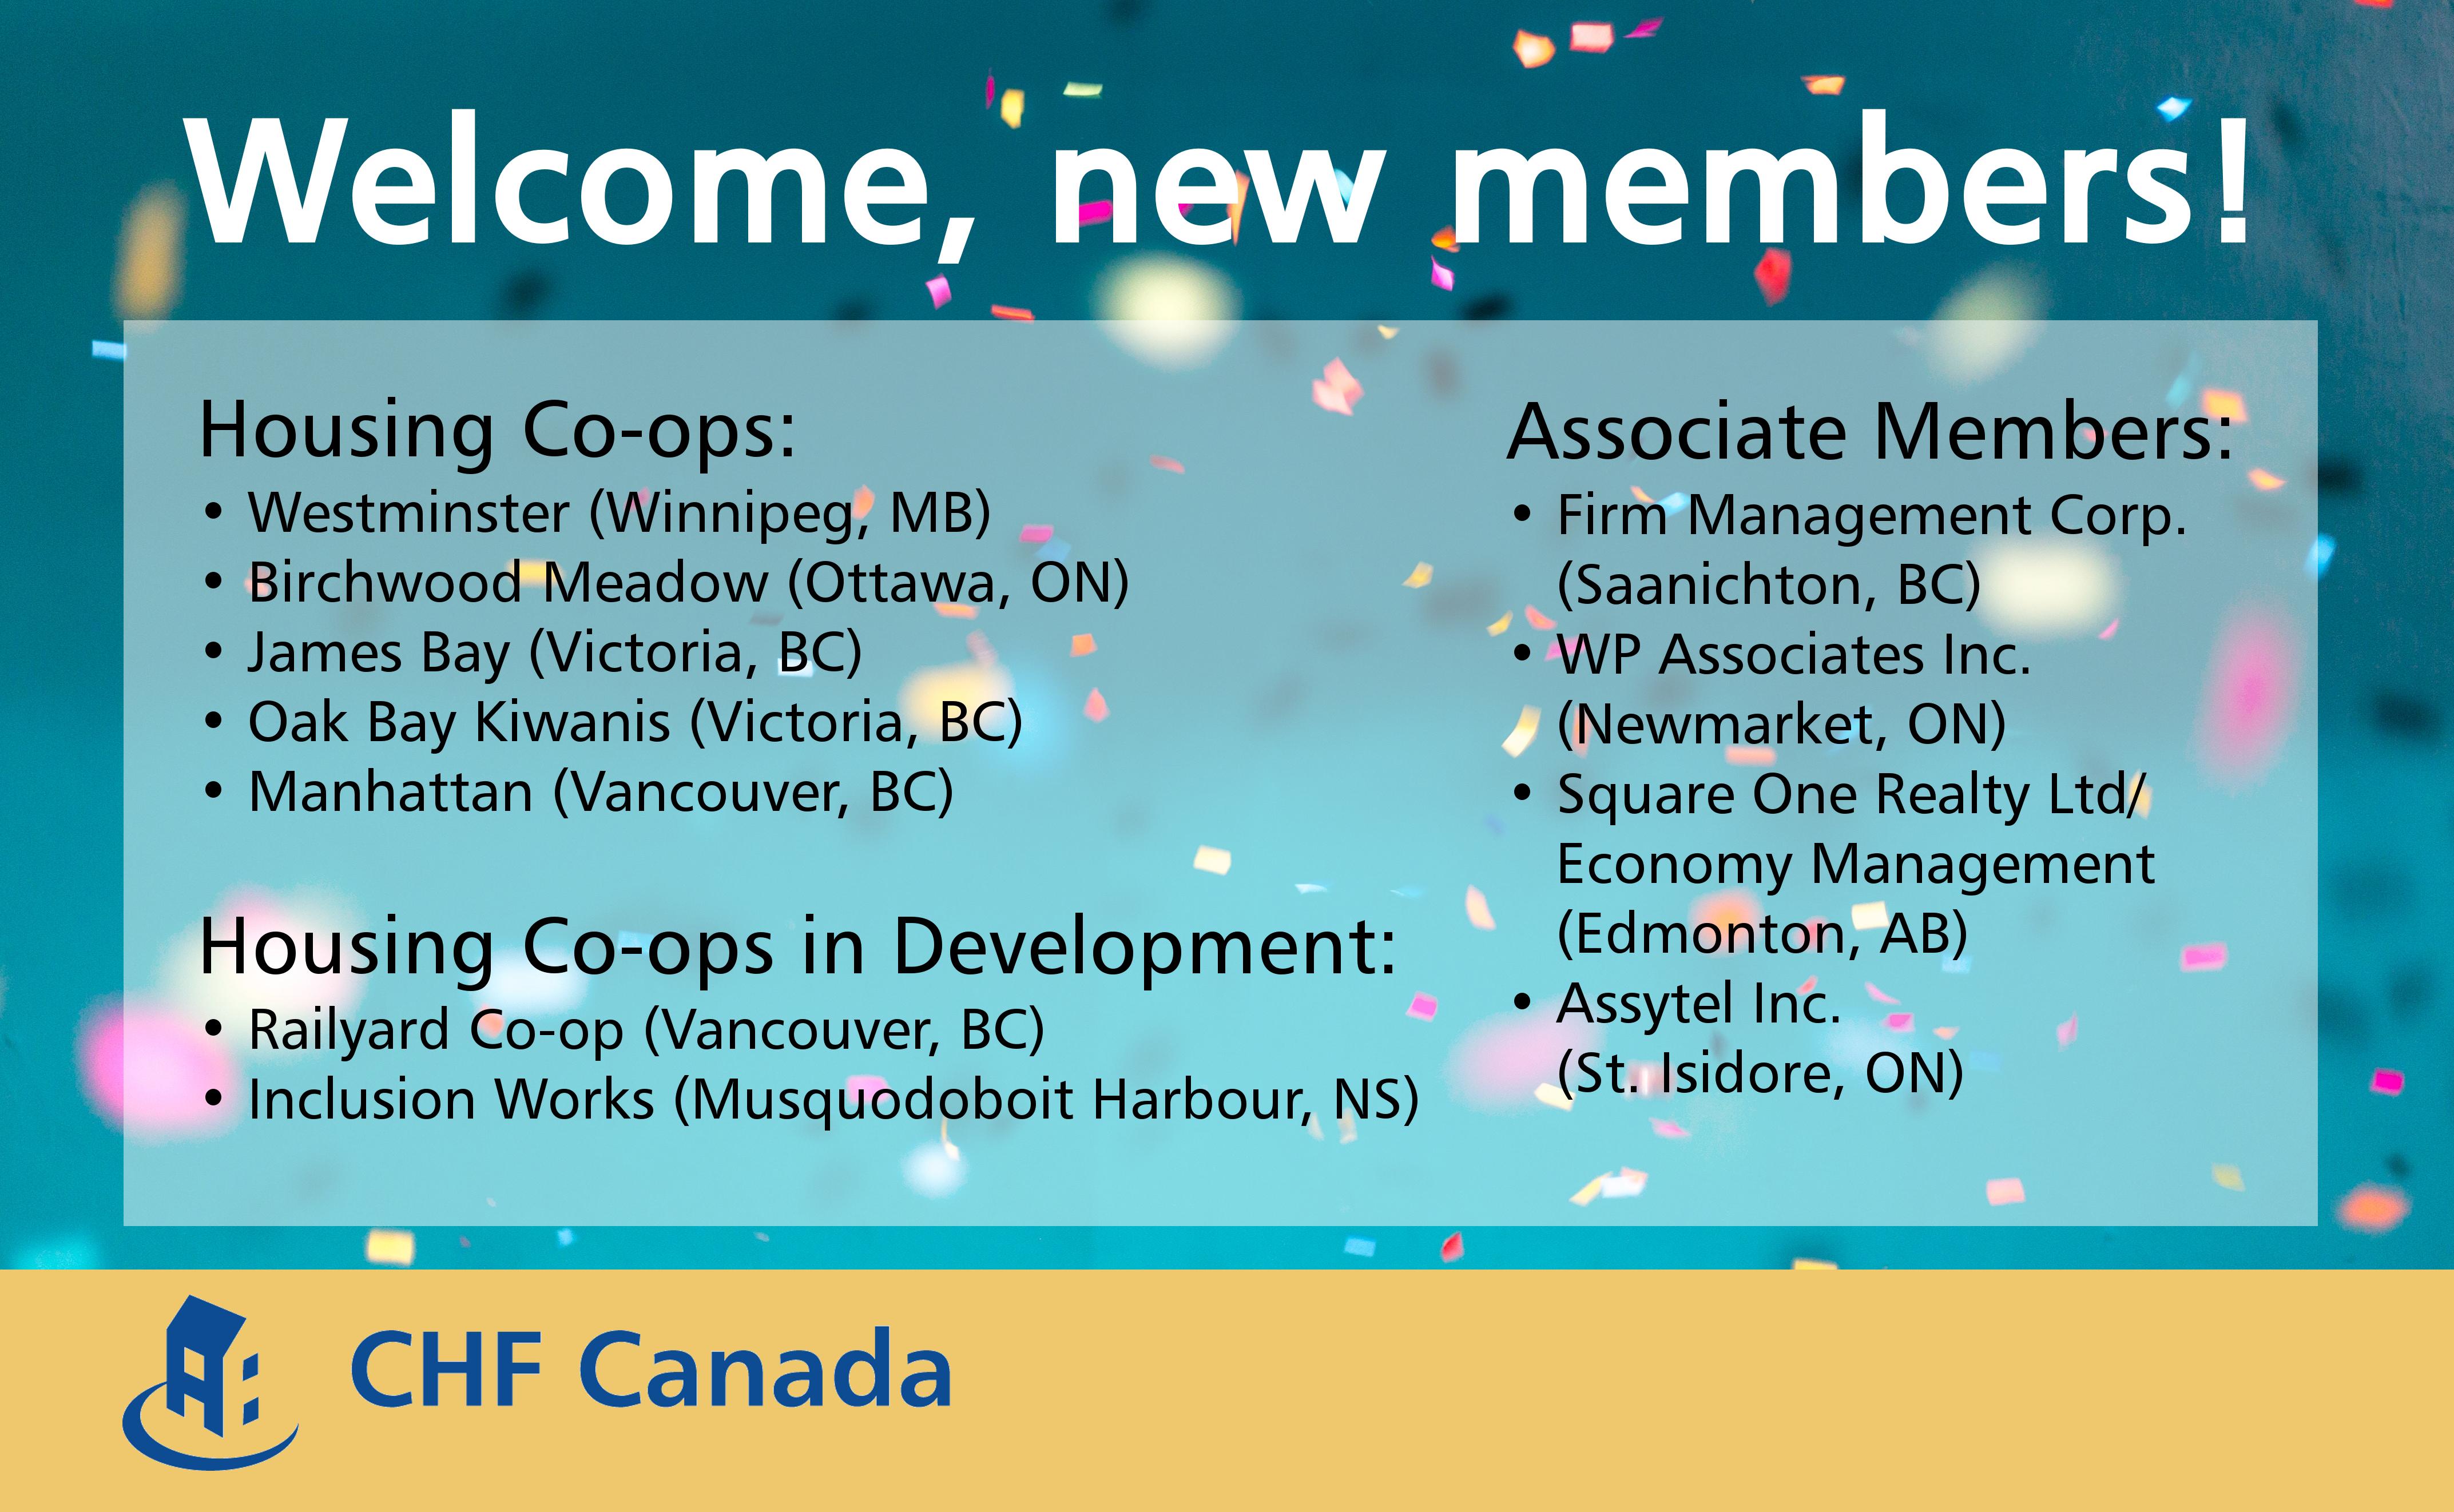 Welcome, new CHF Canada members!